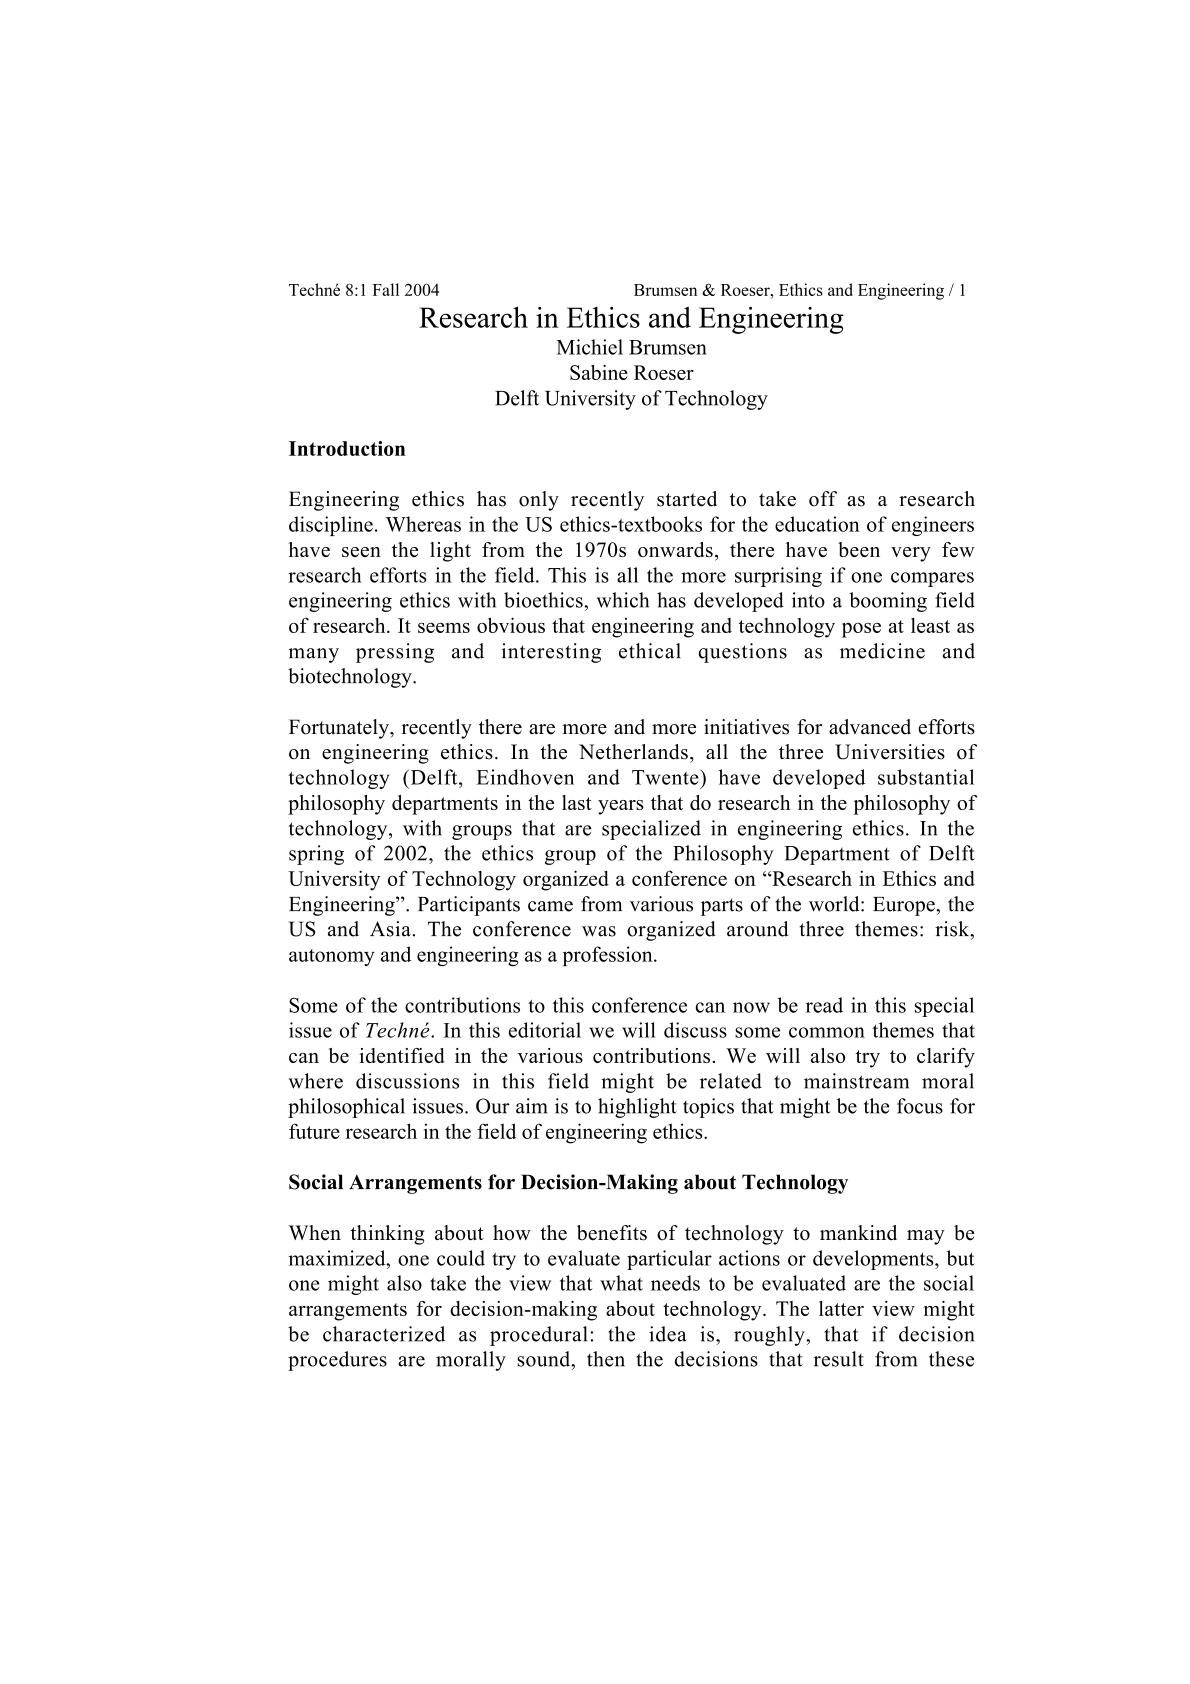 engineering ethics essay examples